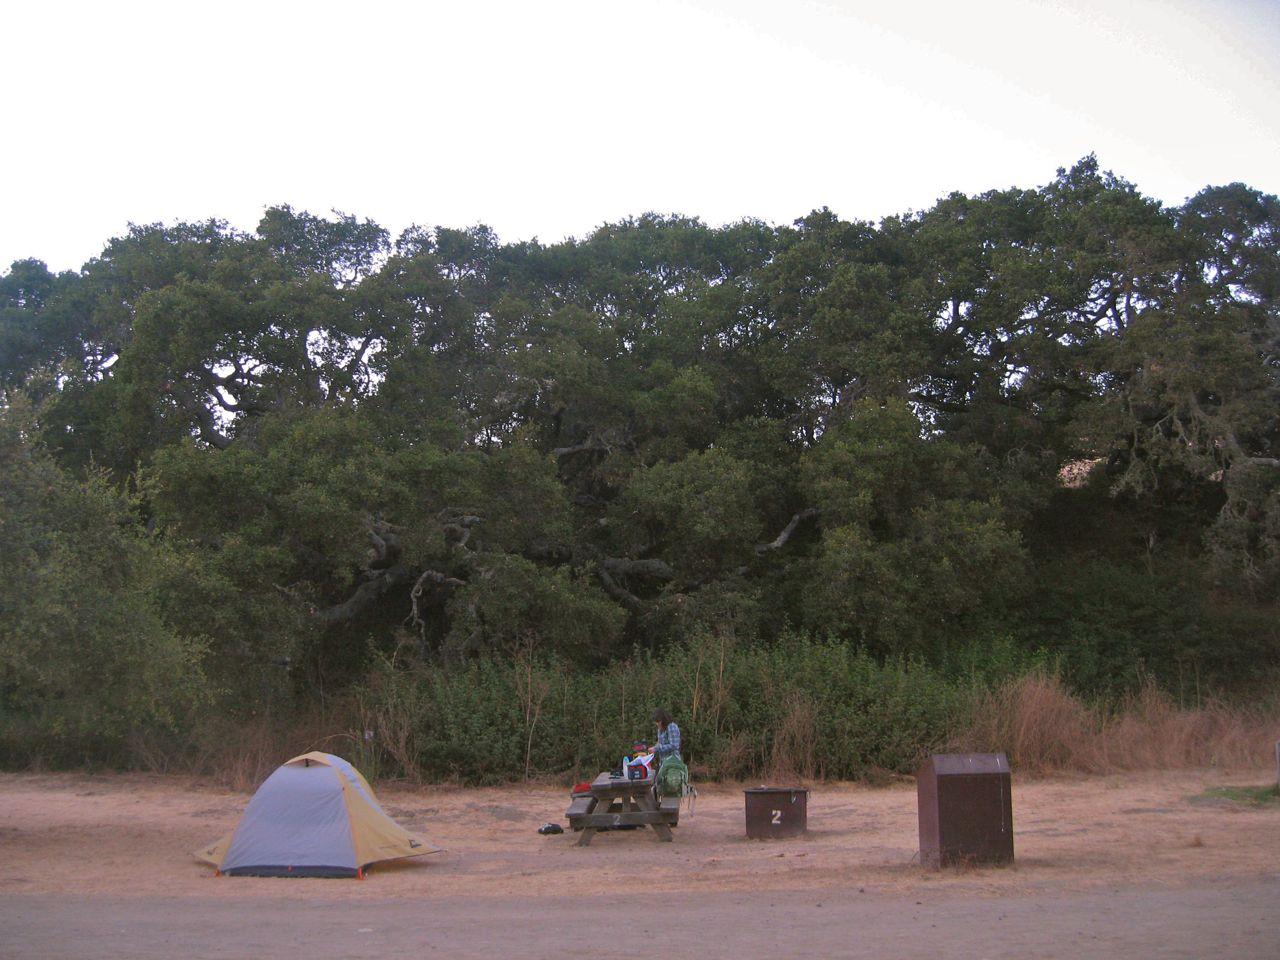 Our campsite at Andrew Molera